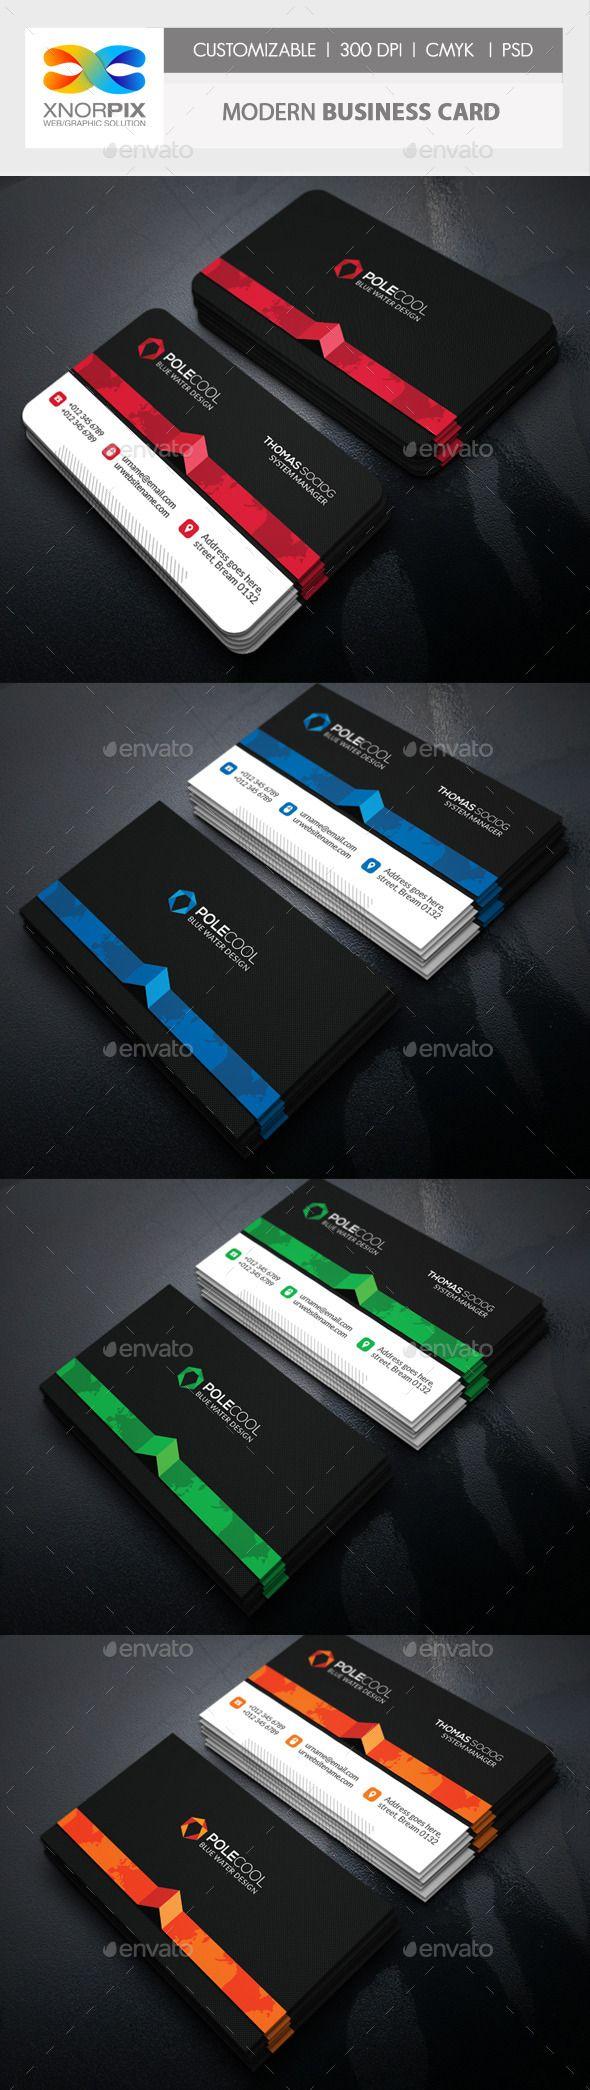 Modern Business Card Template #design Download: http://graphicriver.net/item/modern-business-card/11119300?ref=ksioks